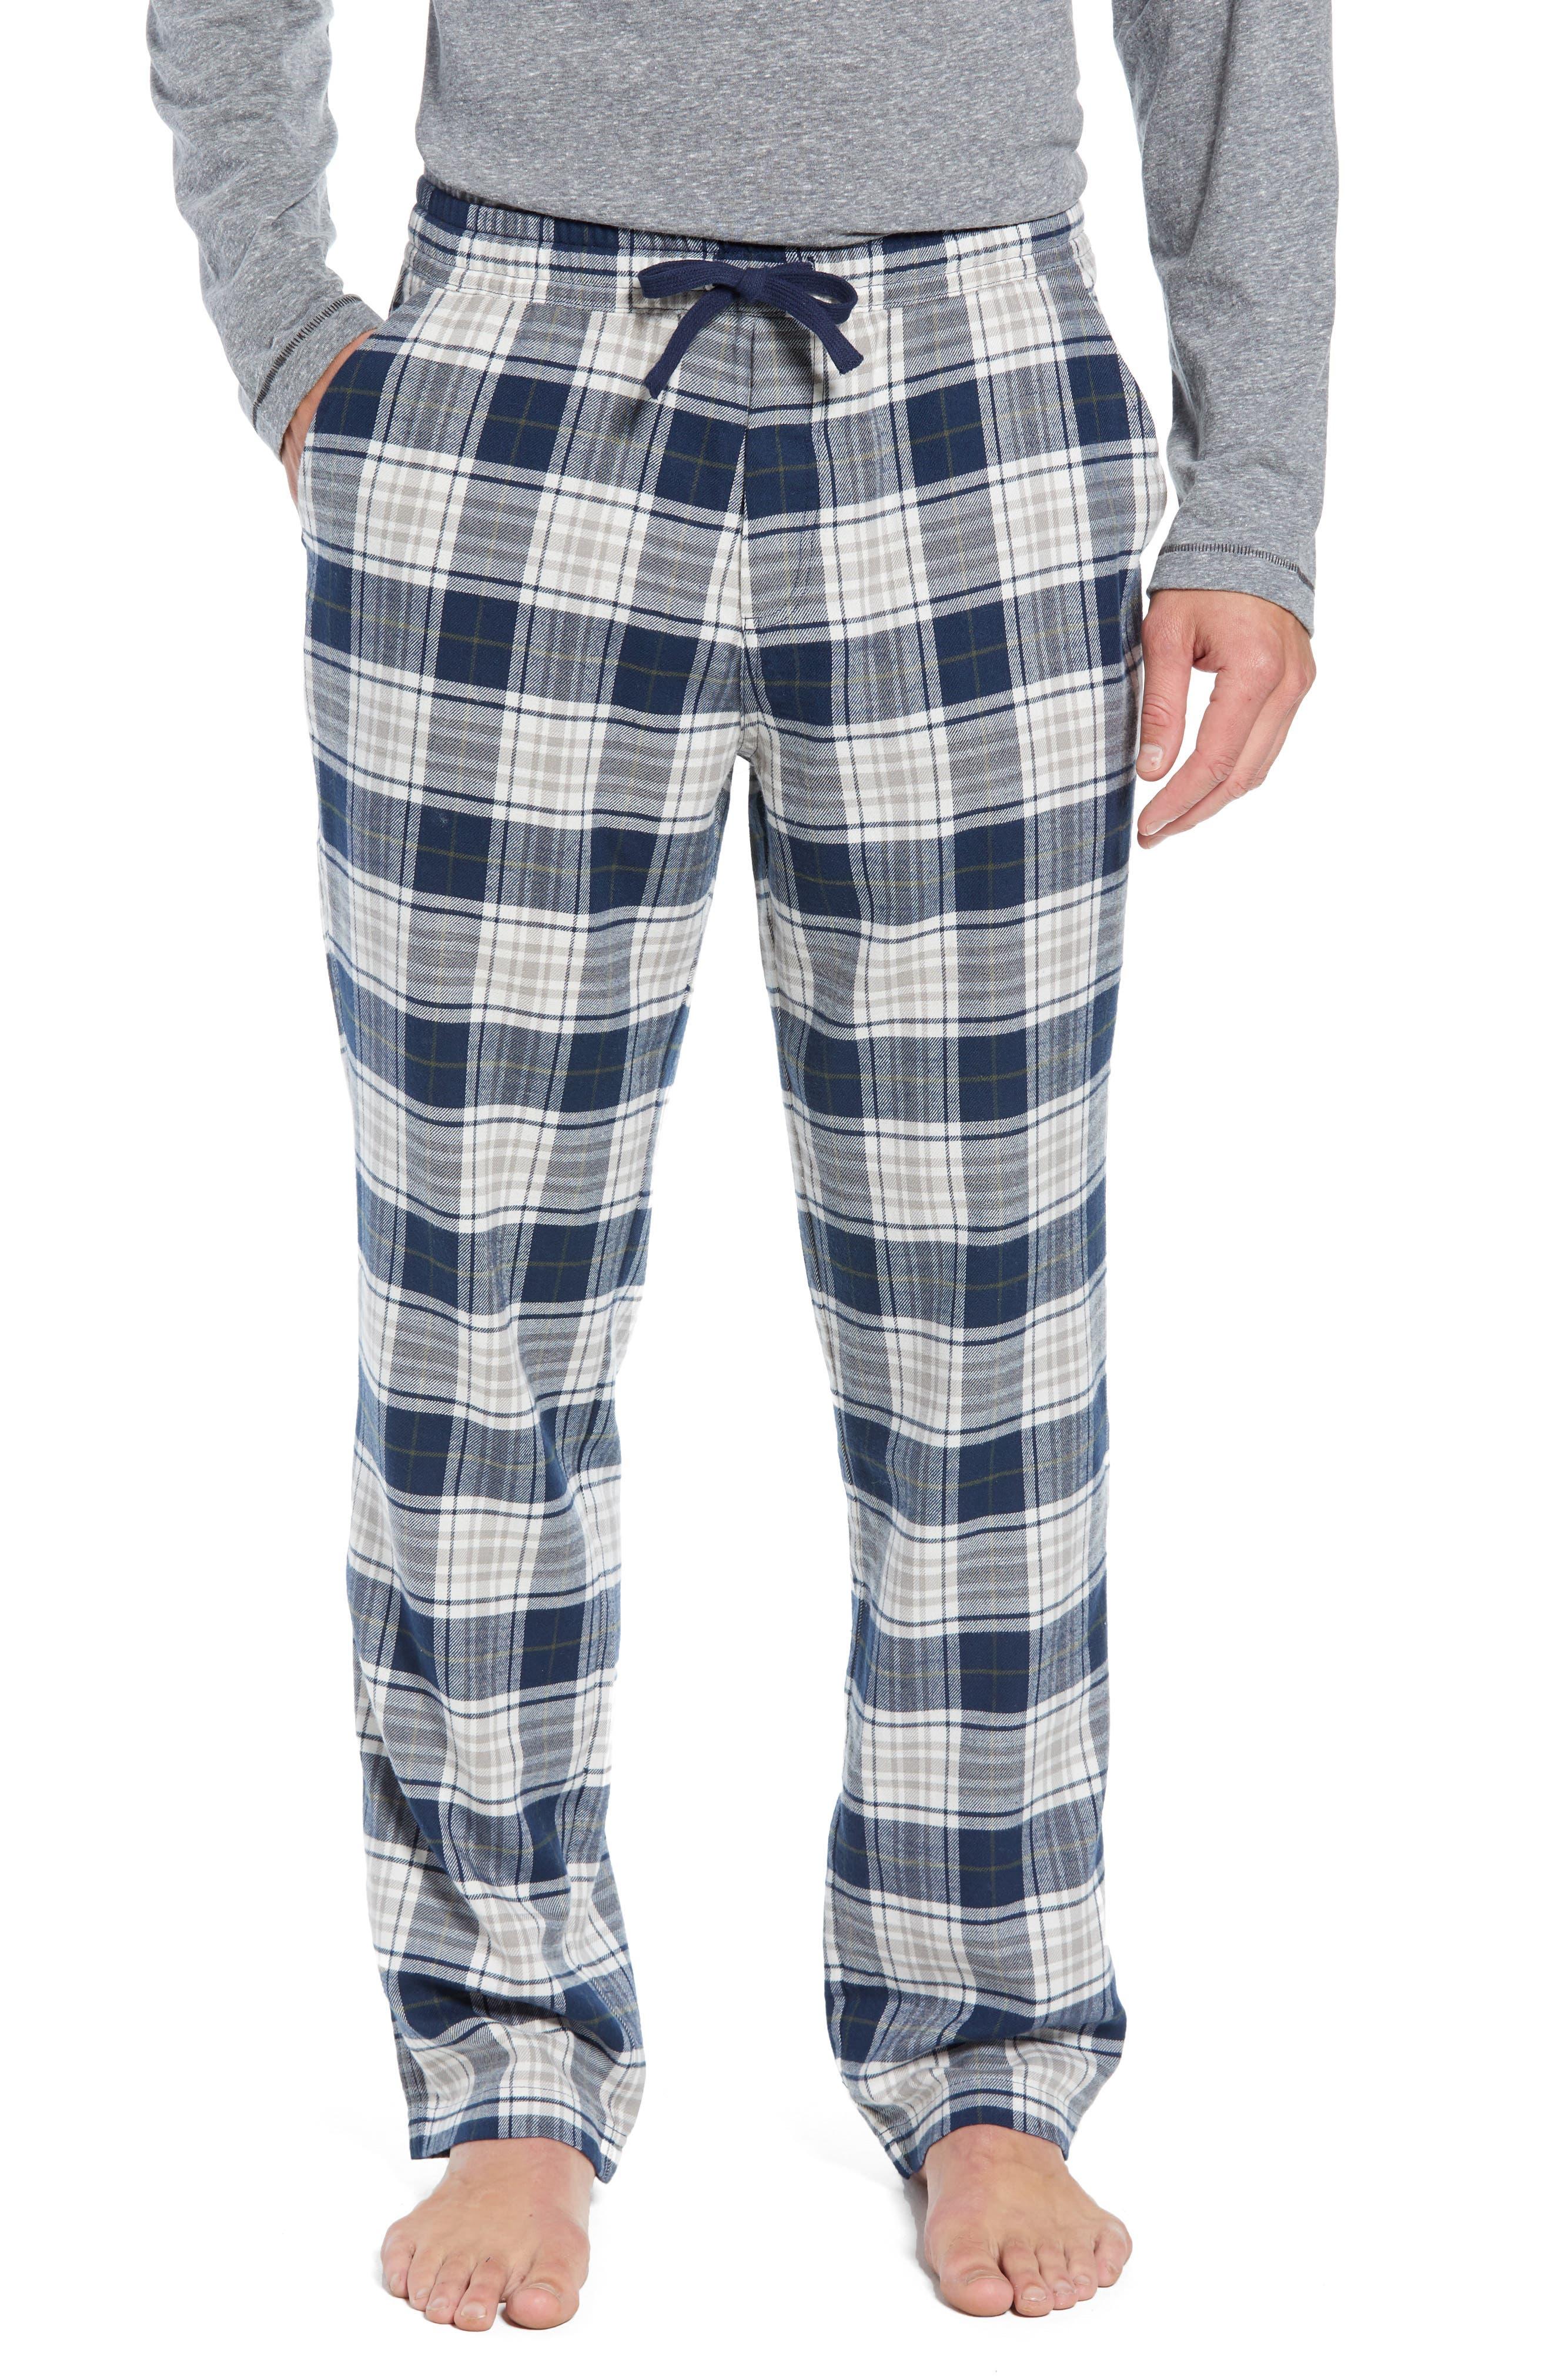 Steiner Pajama Set,                             Main thumbnail 1, color,                             NAVY/ GREY HEATHER